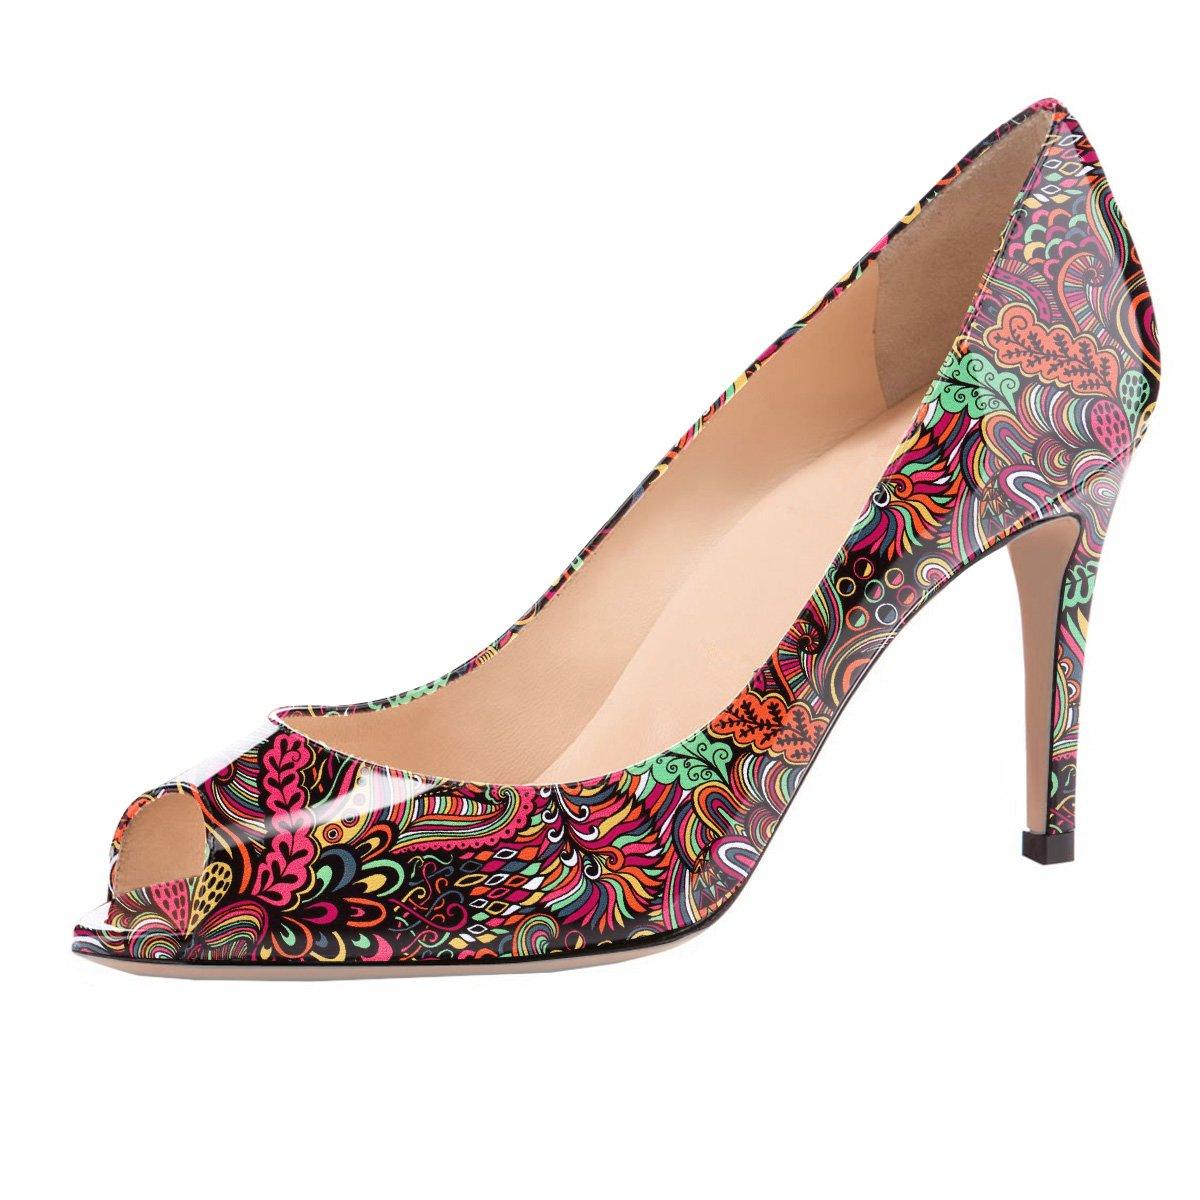 Eldof Women Peep Toe Pumps Mid-Heel Pumps Formal Wedding Bridal Classic Heel Open Toe Stiletto B07F423BZW 10 B(M) US|Red-pattern